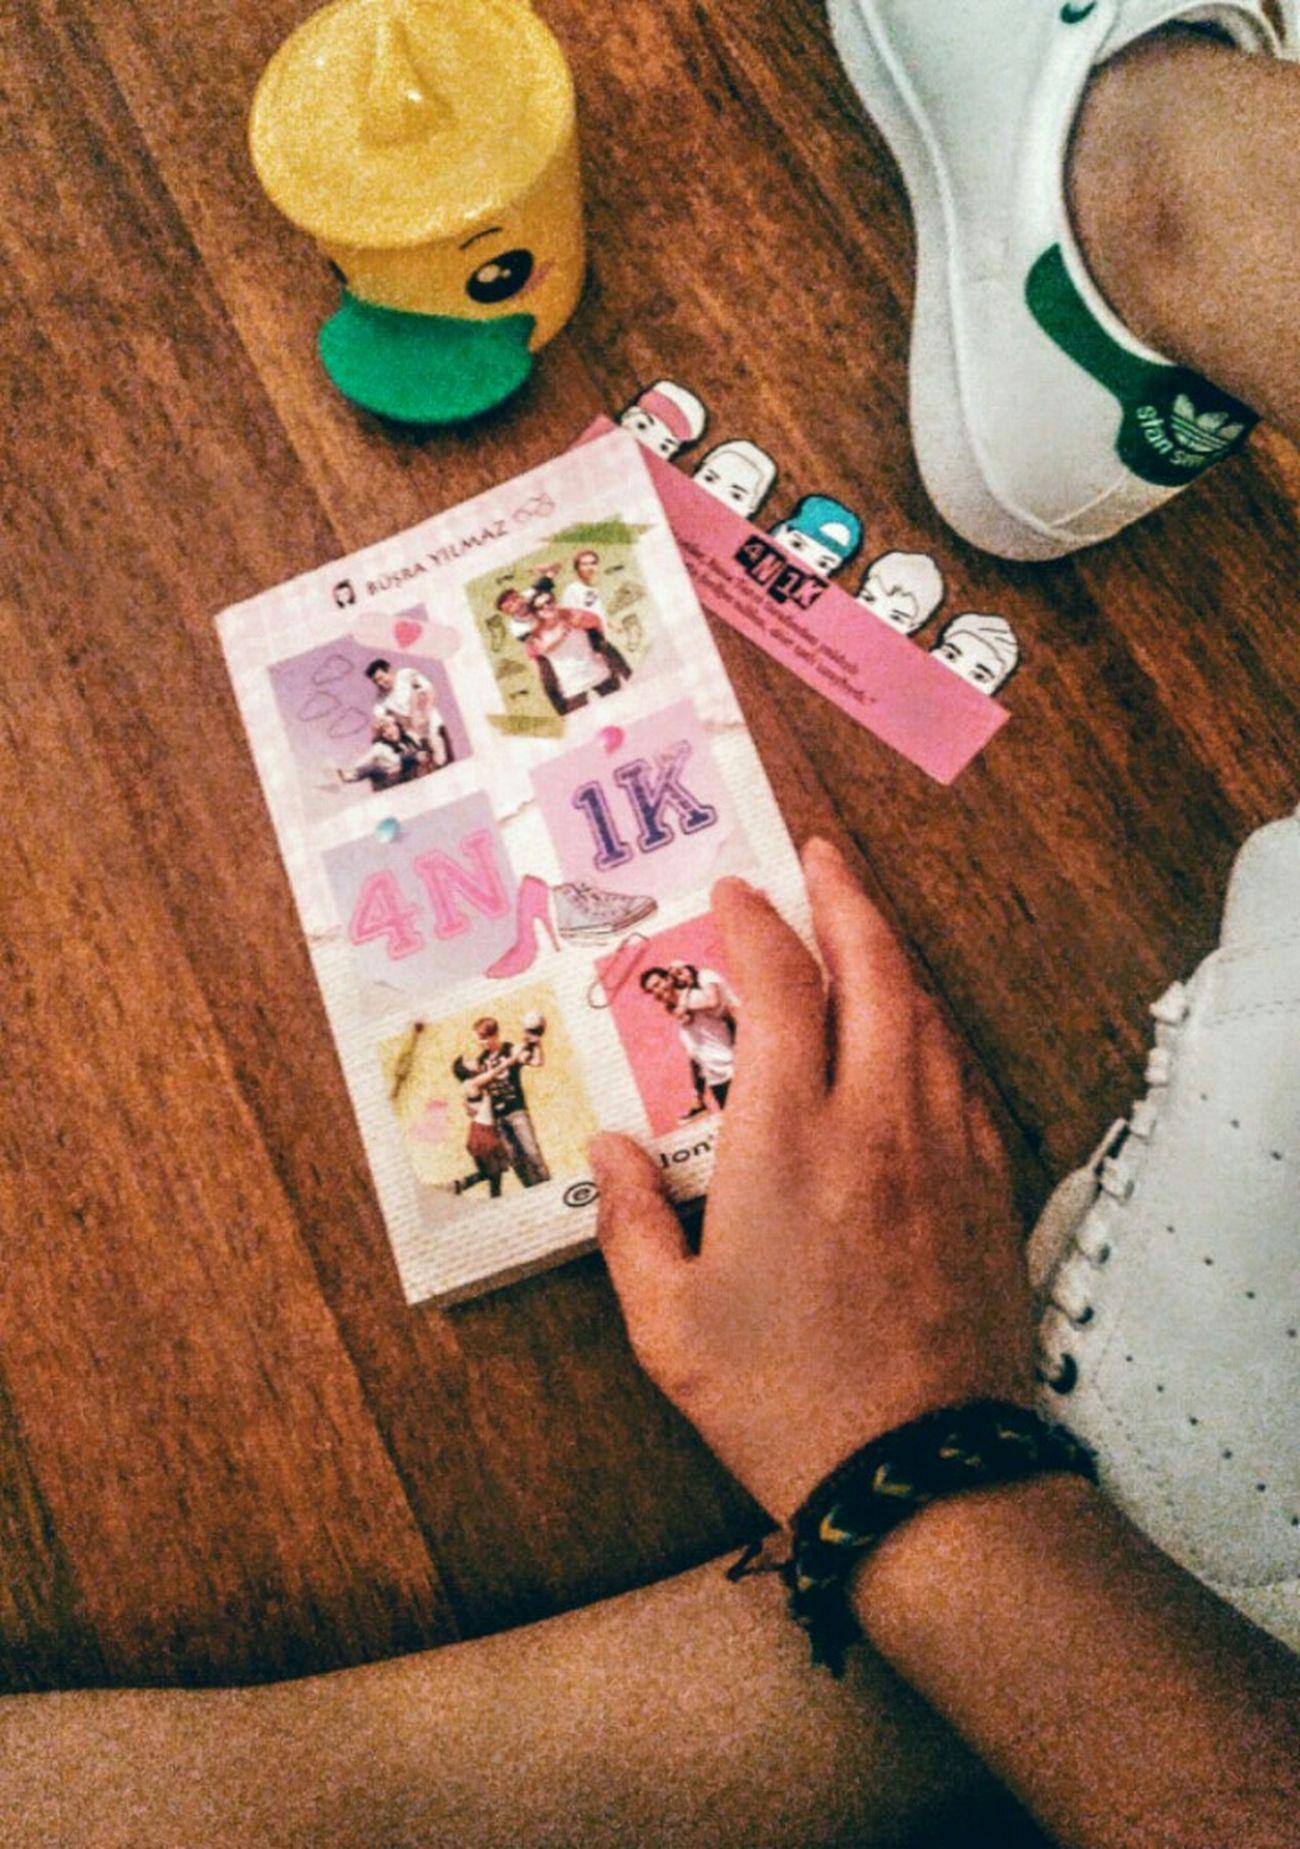 Book Book Collections Mobilephotography Interesting Book Funny Book 4n1k Mizah Love Pink Ahşap Ayakkabı First Eyeem Photo Likesforlikes Turkey Ankara Takin Photos Perfect Book Büşra Yılmaz Pink